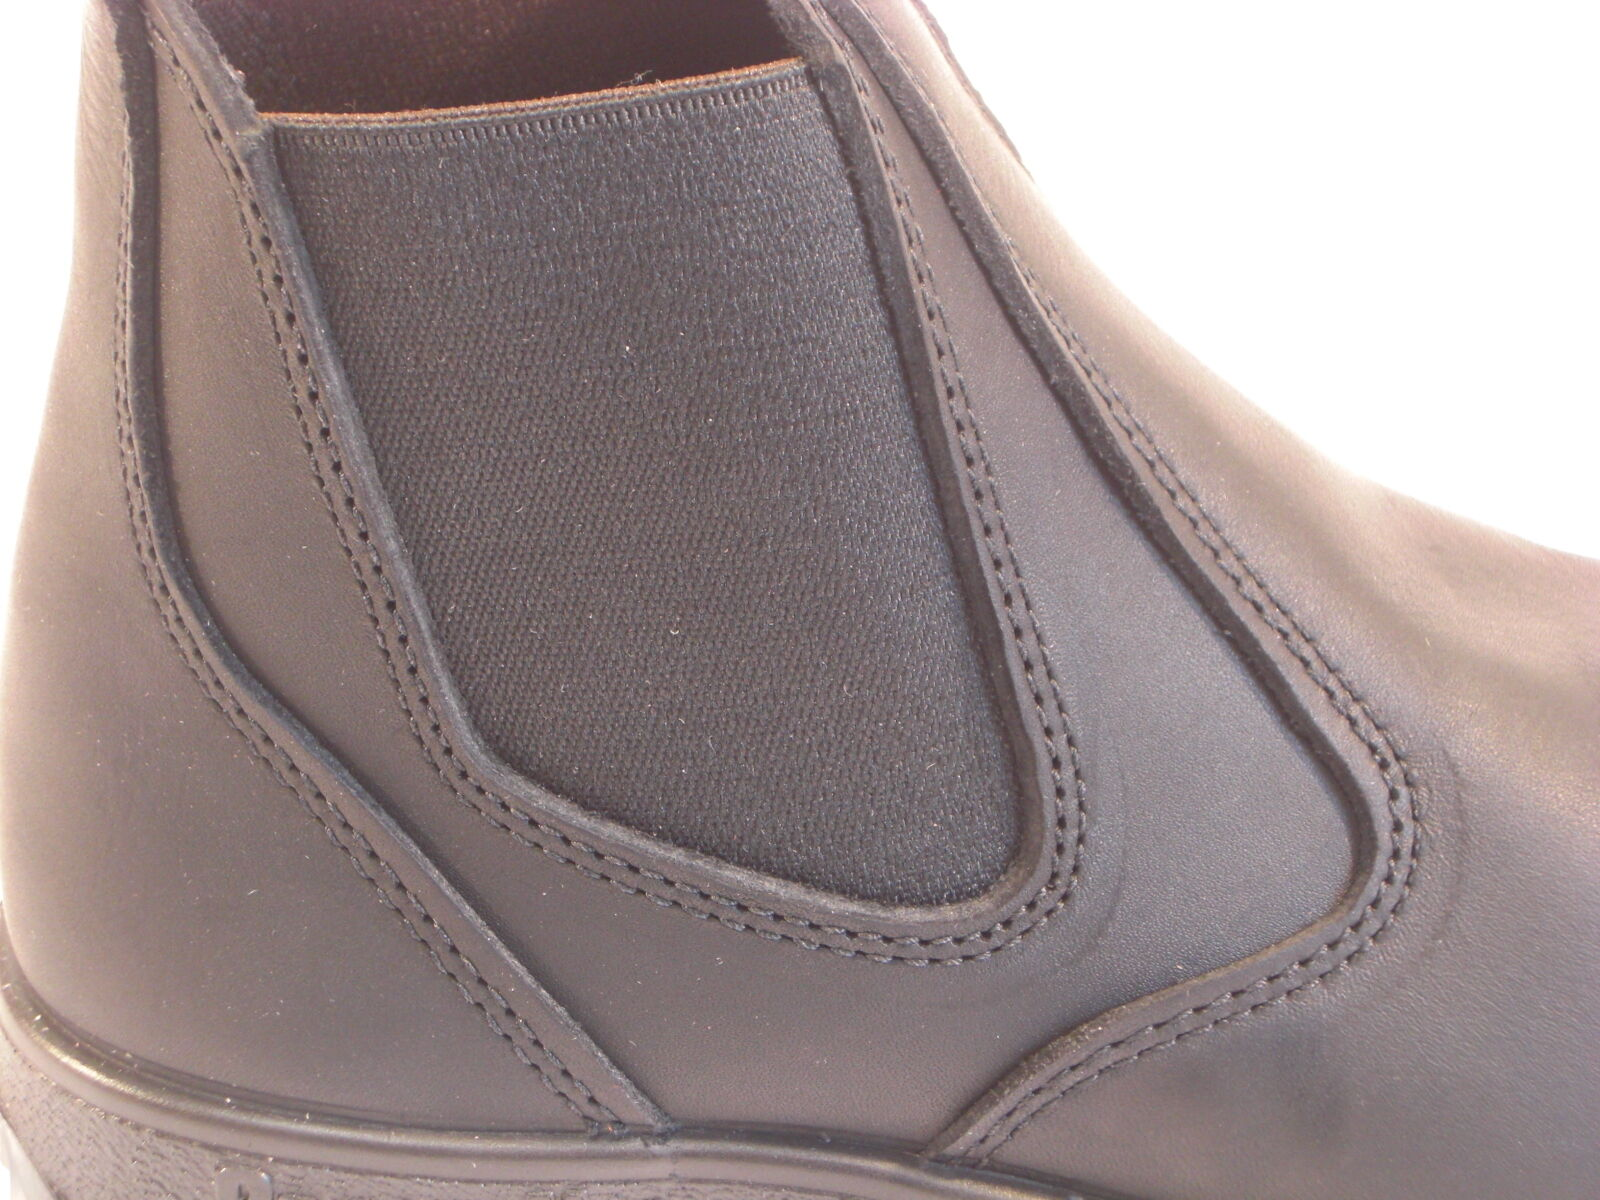 AUSTRALIANA redback Botines botas de trabajo usbbk Negro PUNTERAS Negro usbbk 2fcca5